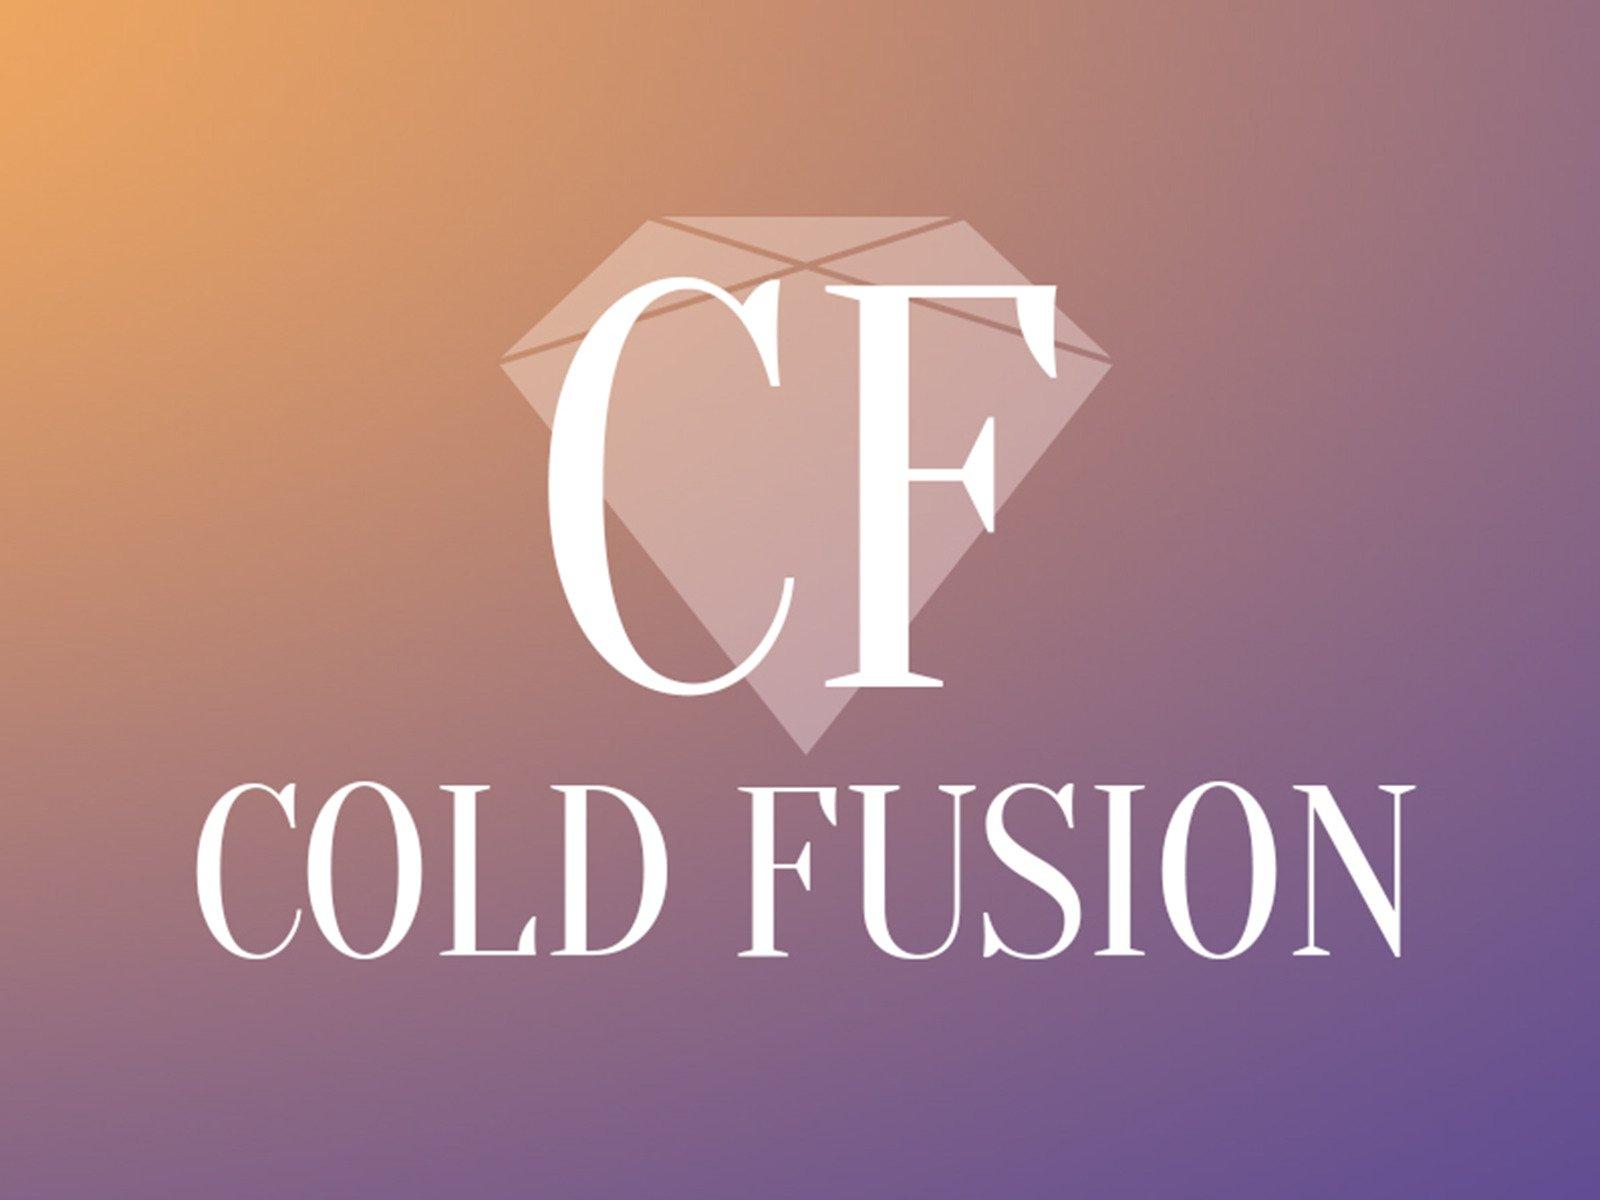 ColdFusion - Season 1